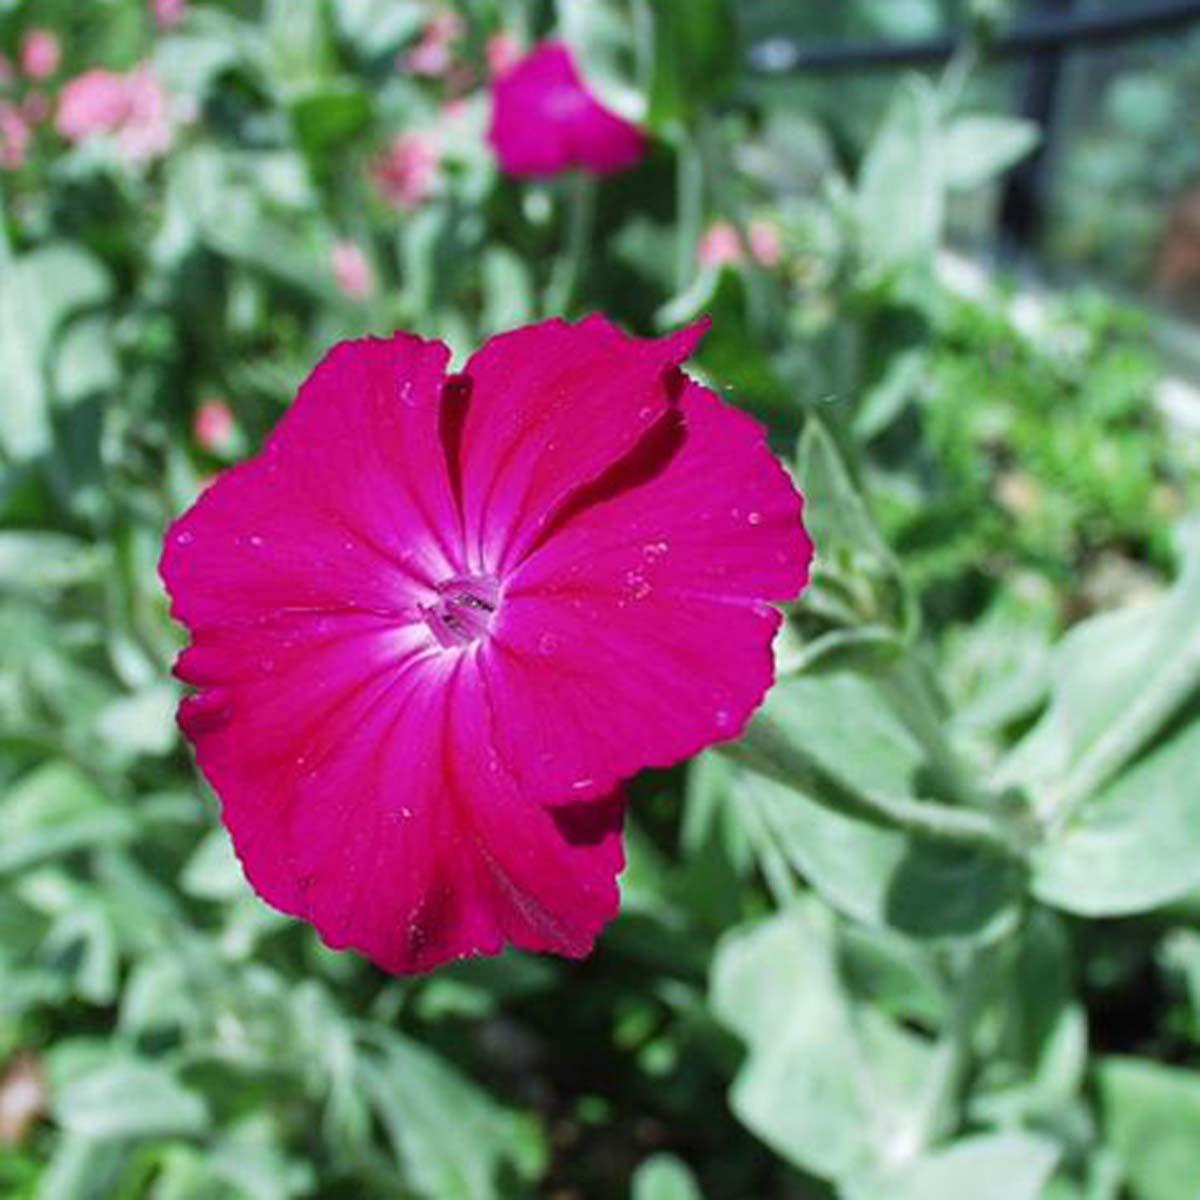 Coquelourde des jardins silene coronaria quelle est - Coquelourde des jardins lychnis coronaria ...